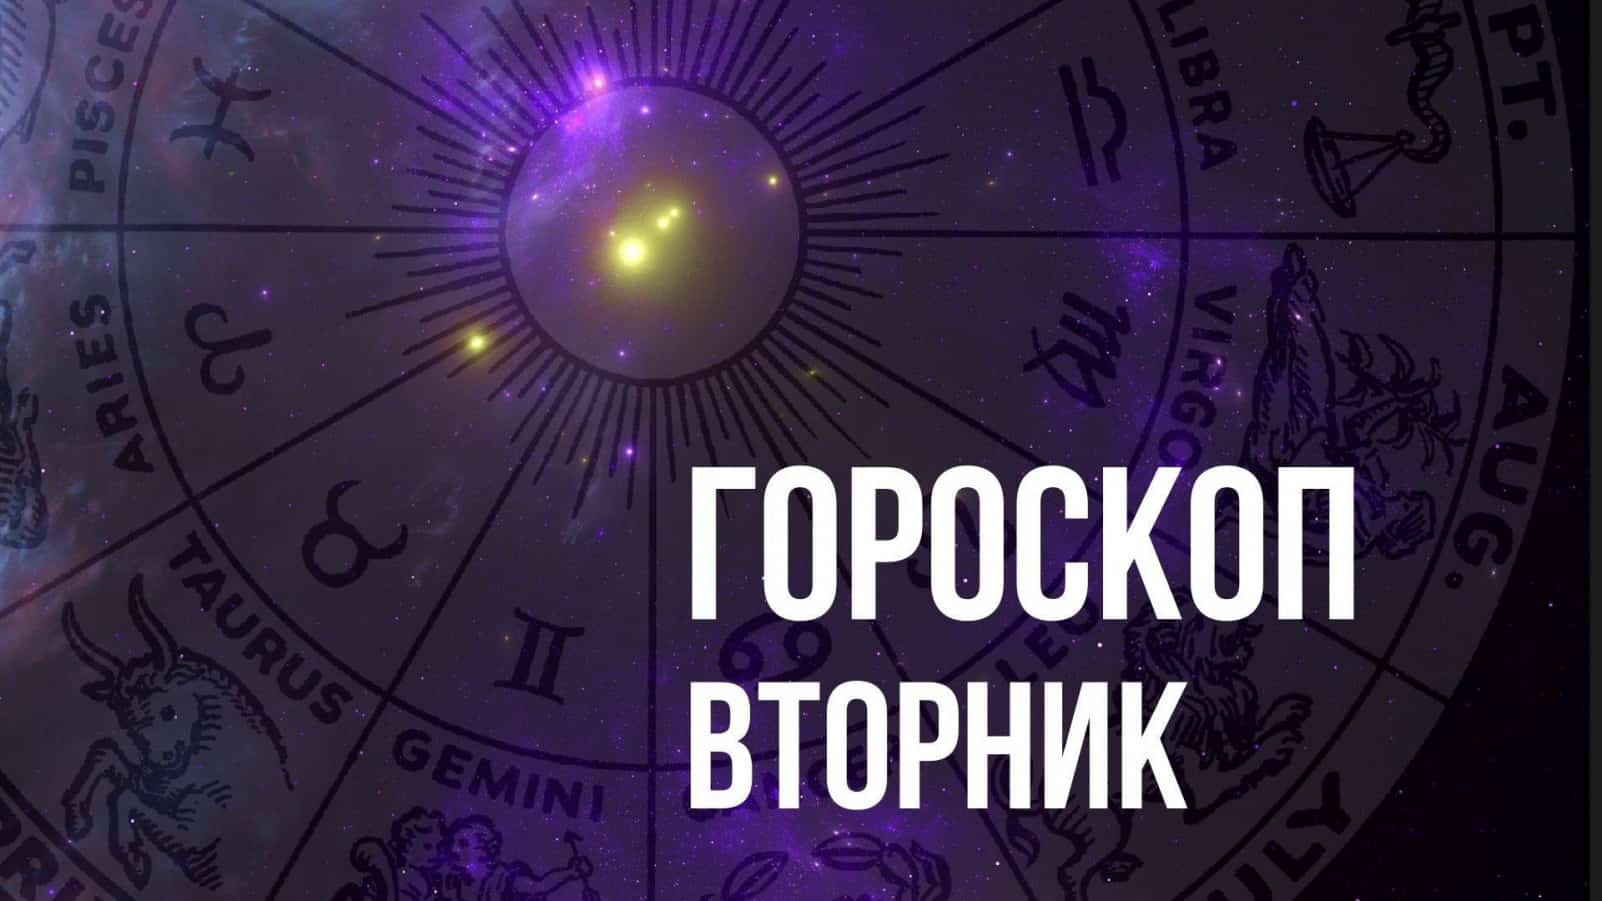 Гороскоп на вторник 17 августа для каждого знака Зодиака